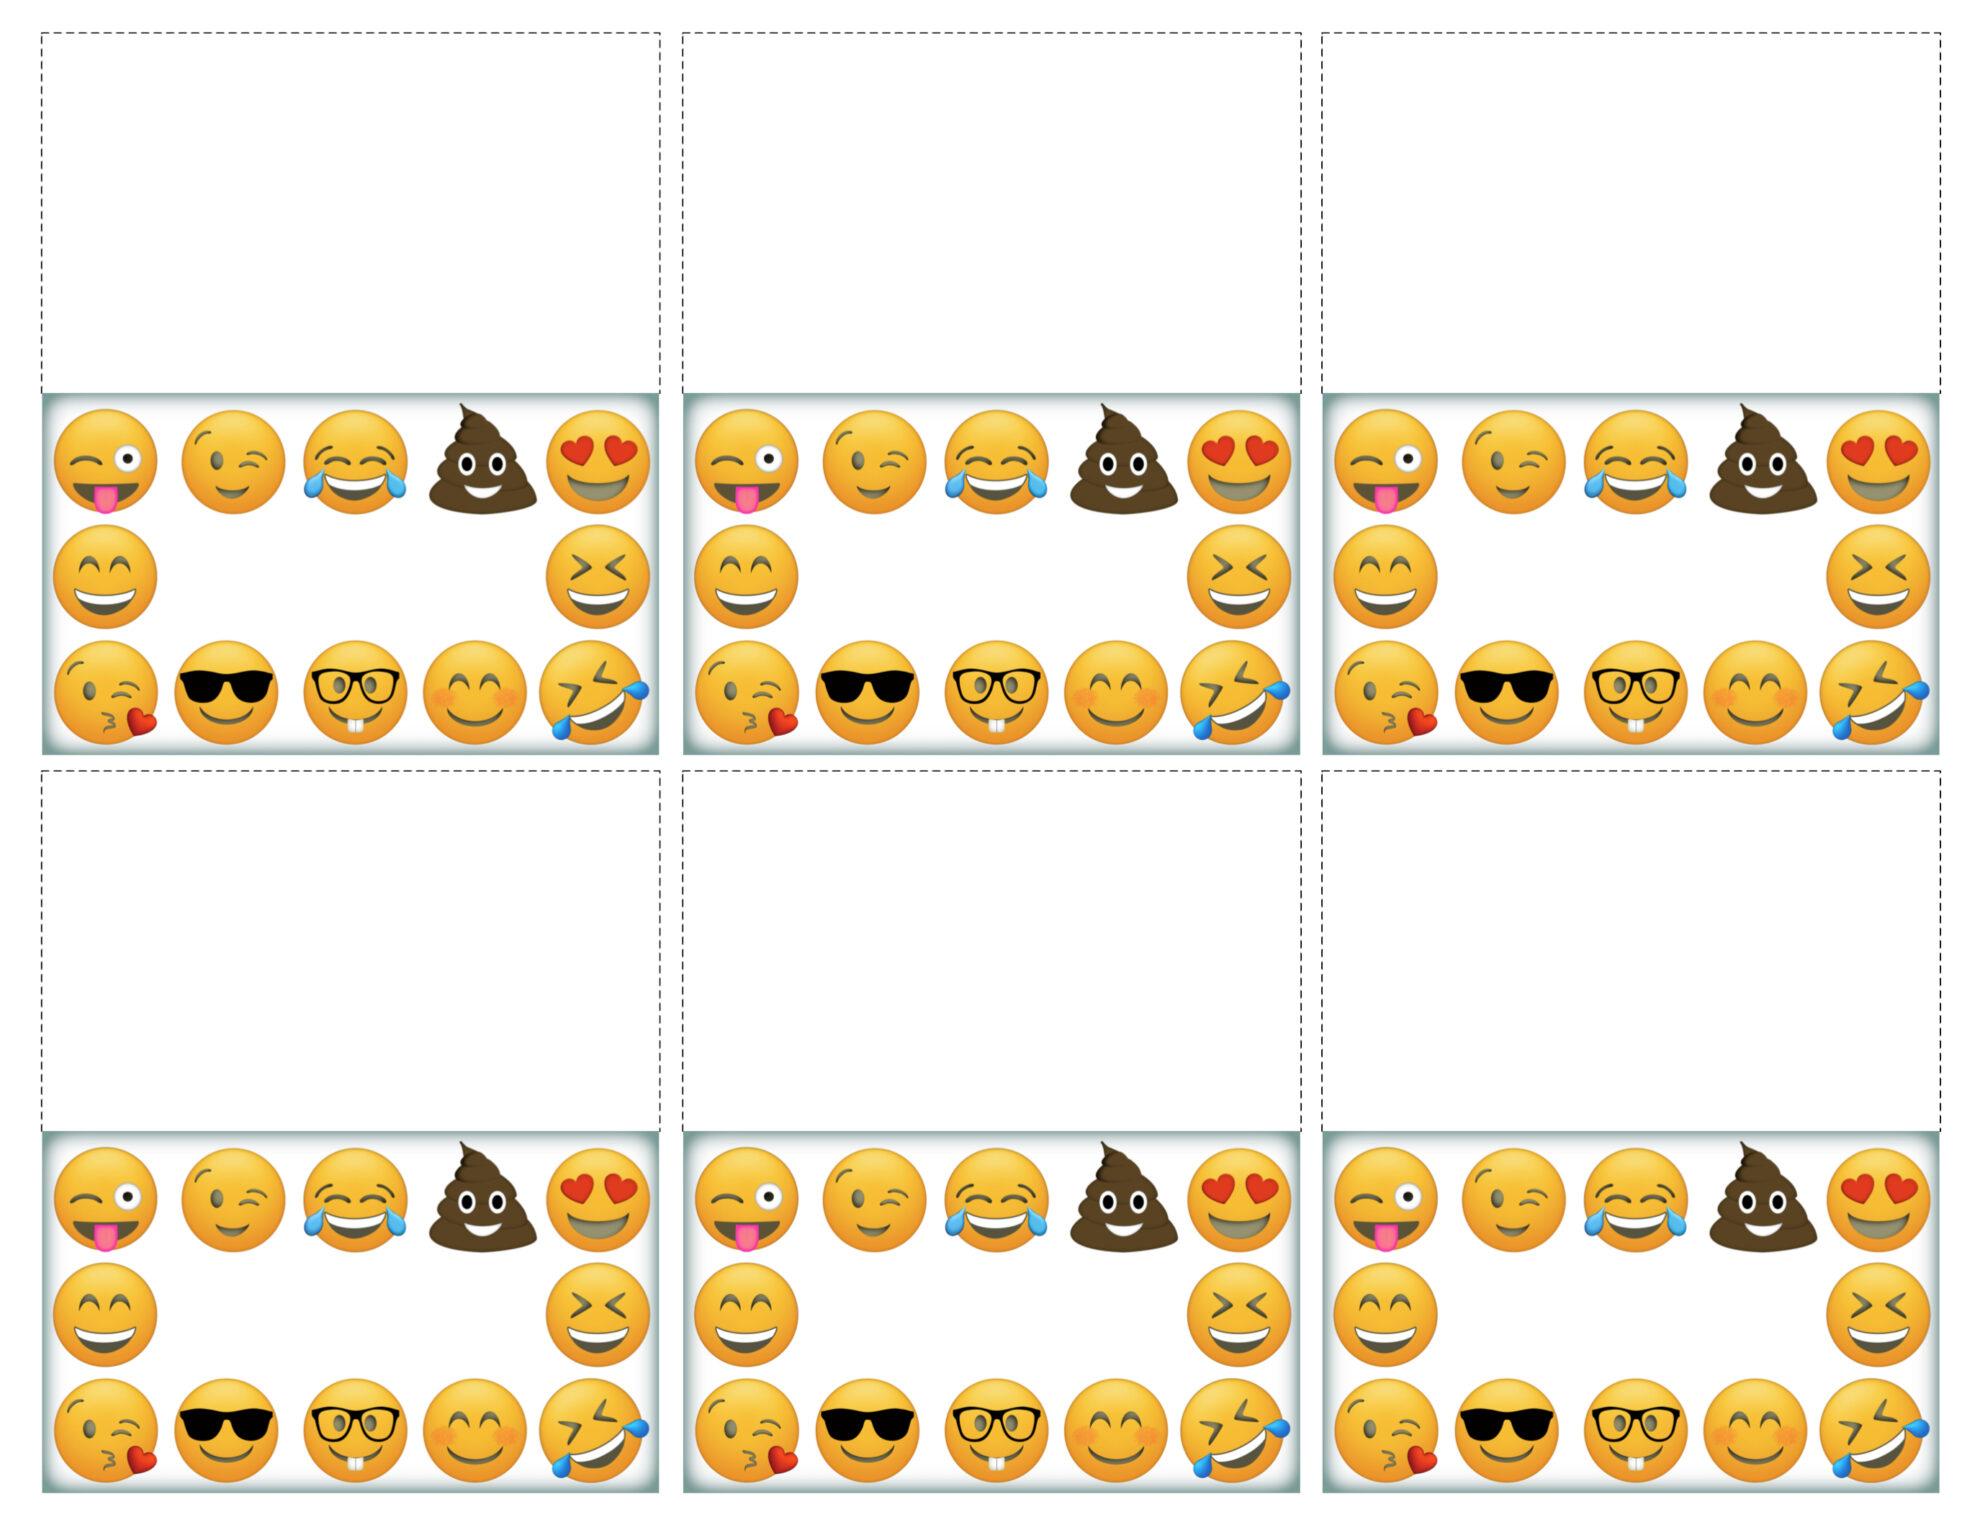 Emoji labels emoji place cards emoji food labels paper trail design emoji birthday party free printable emoji labels emoji place cards emoji food labels emoji birthday party free printable bookmarktalkfo Image collections